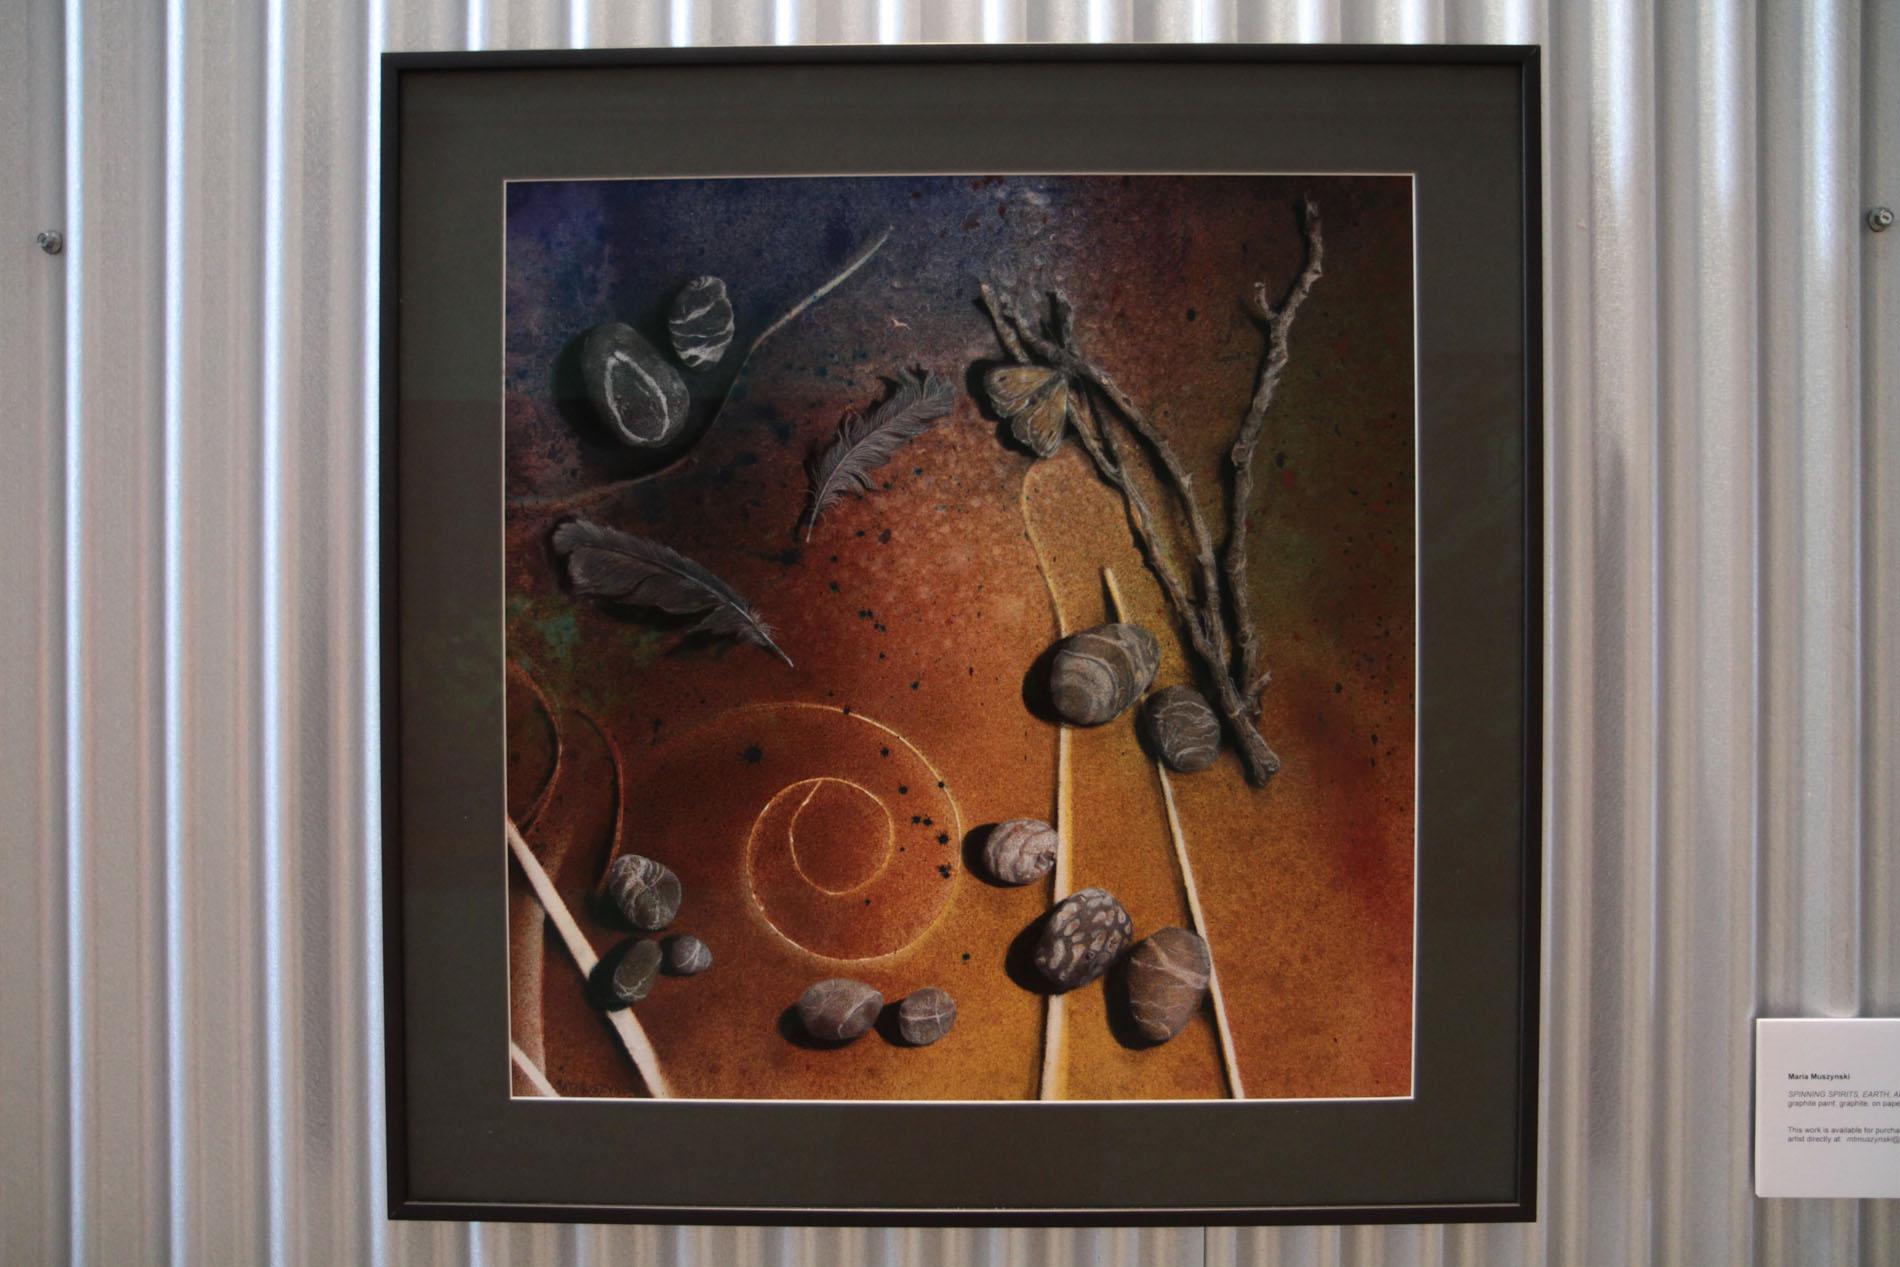 maria-muszynski-spinning-spirits-earth-and-air